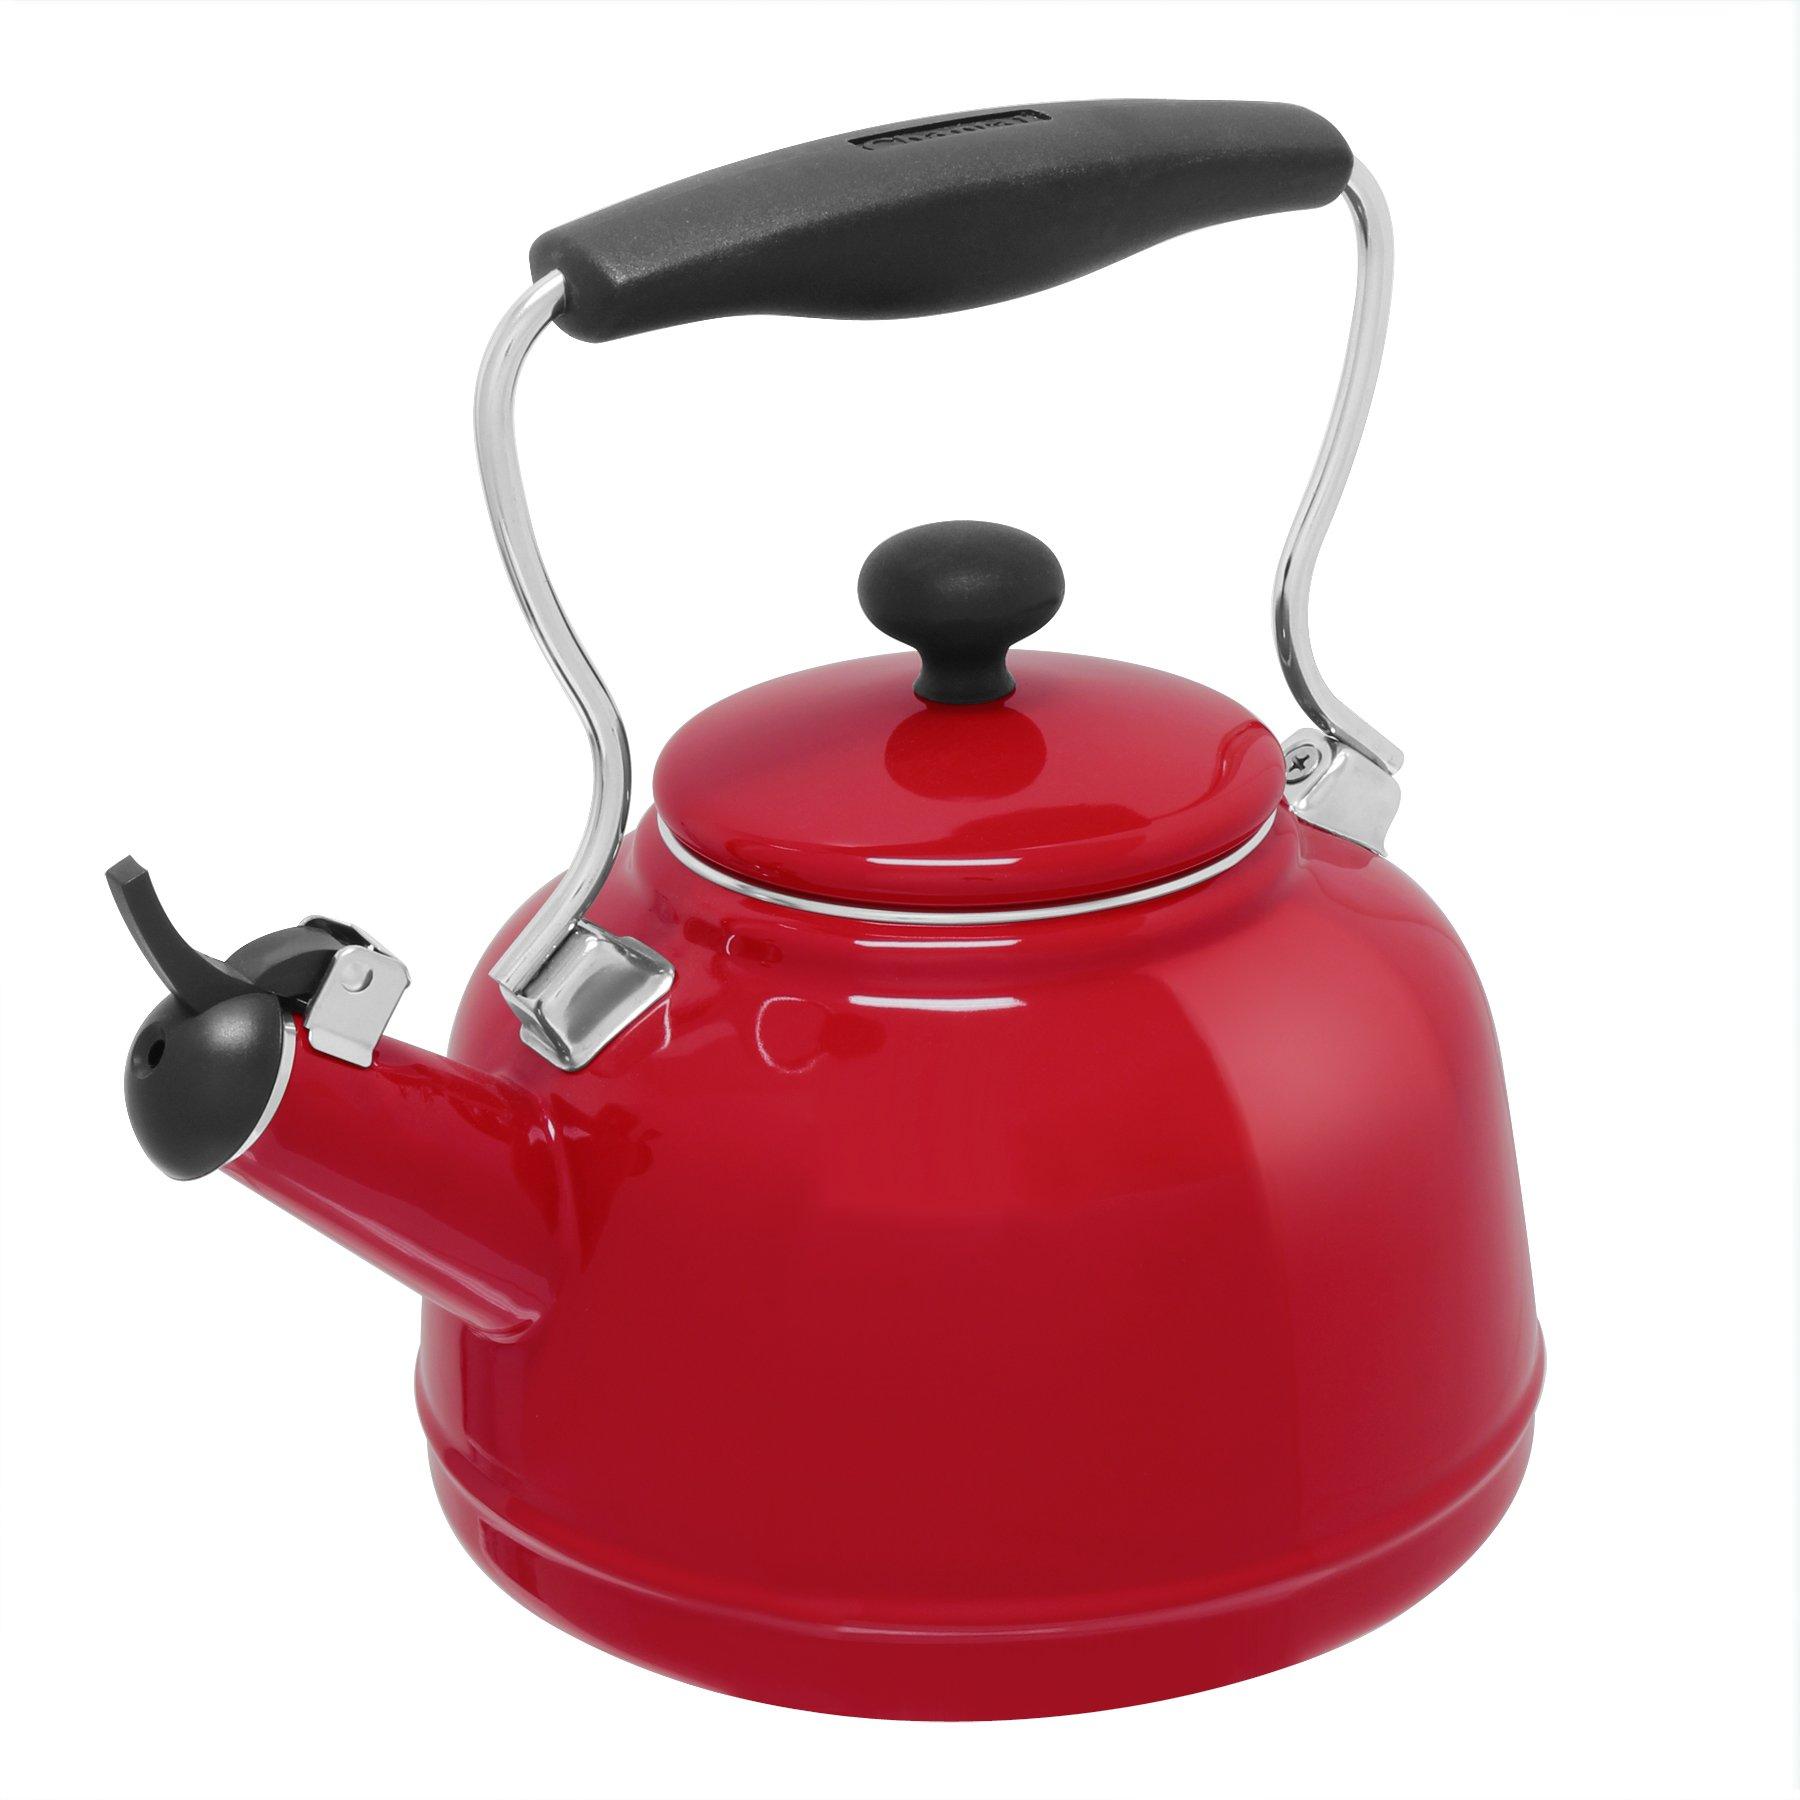 Chantal 37-VINT RE Enamel on Steel Vintage Teakettle, 1.7 quart, Red